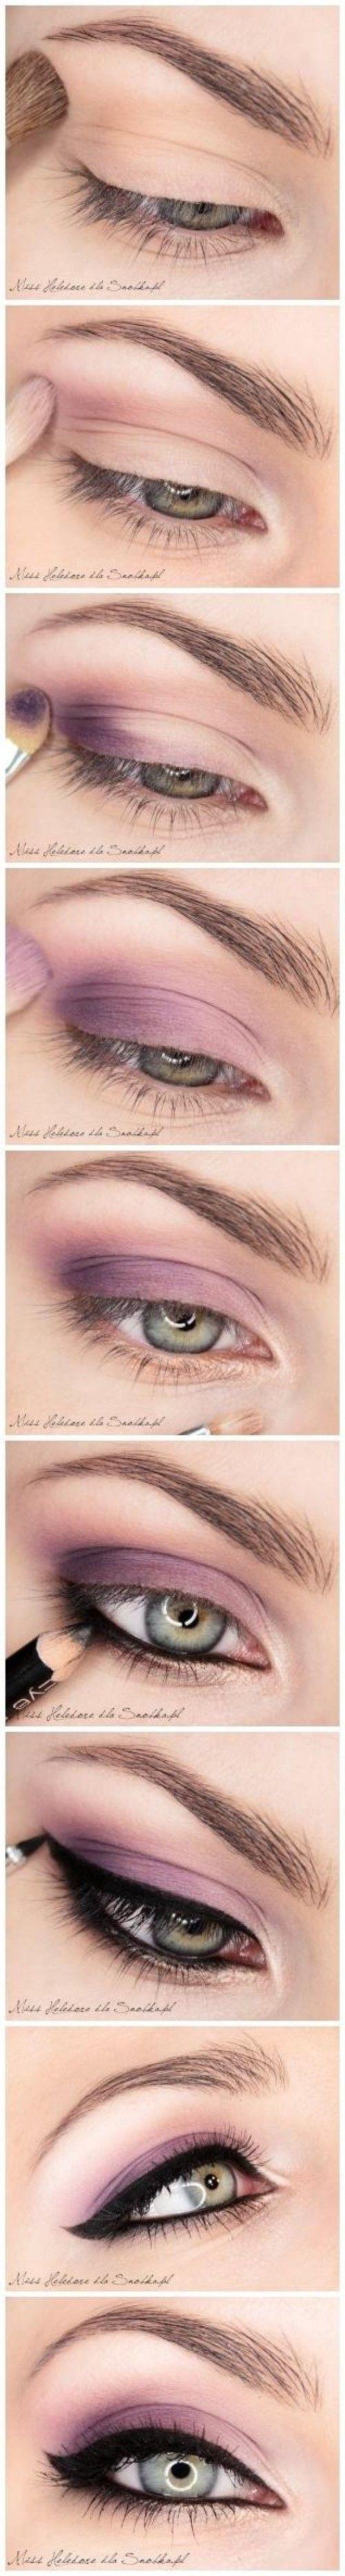 15 Attractive Smokey Eye Makeup Tutorials